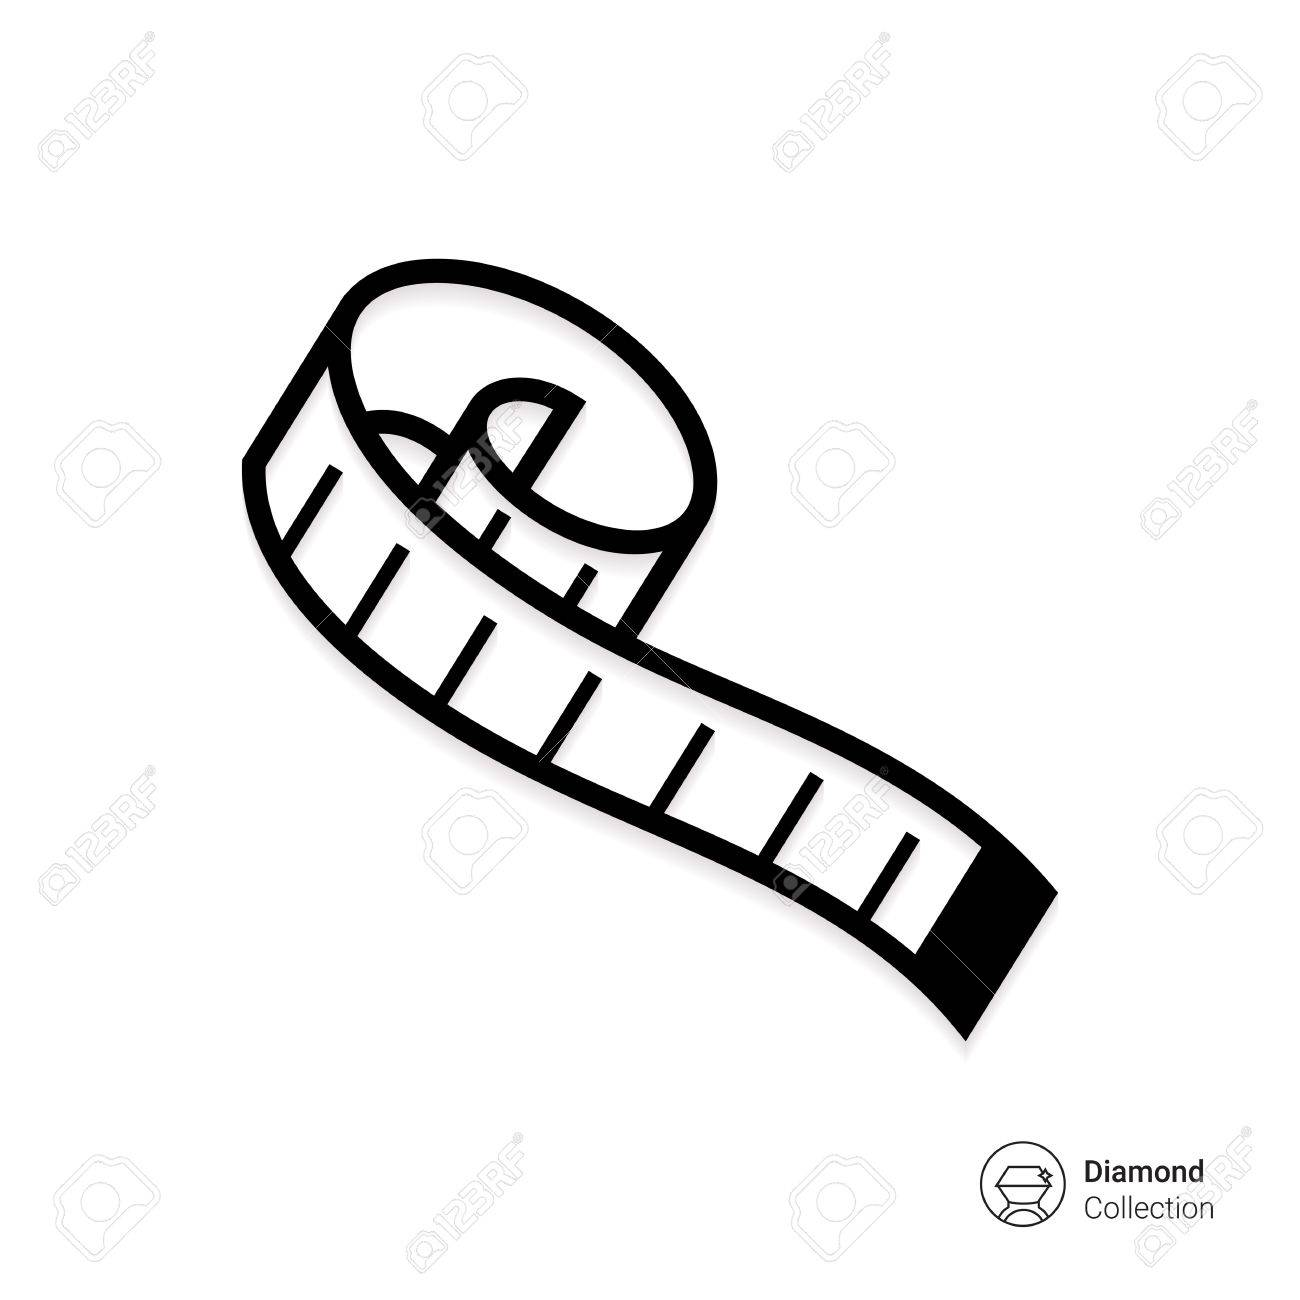 Clip Art: Tools: Tape Measure B&W I abcteach.com | abcteach